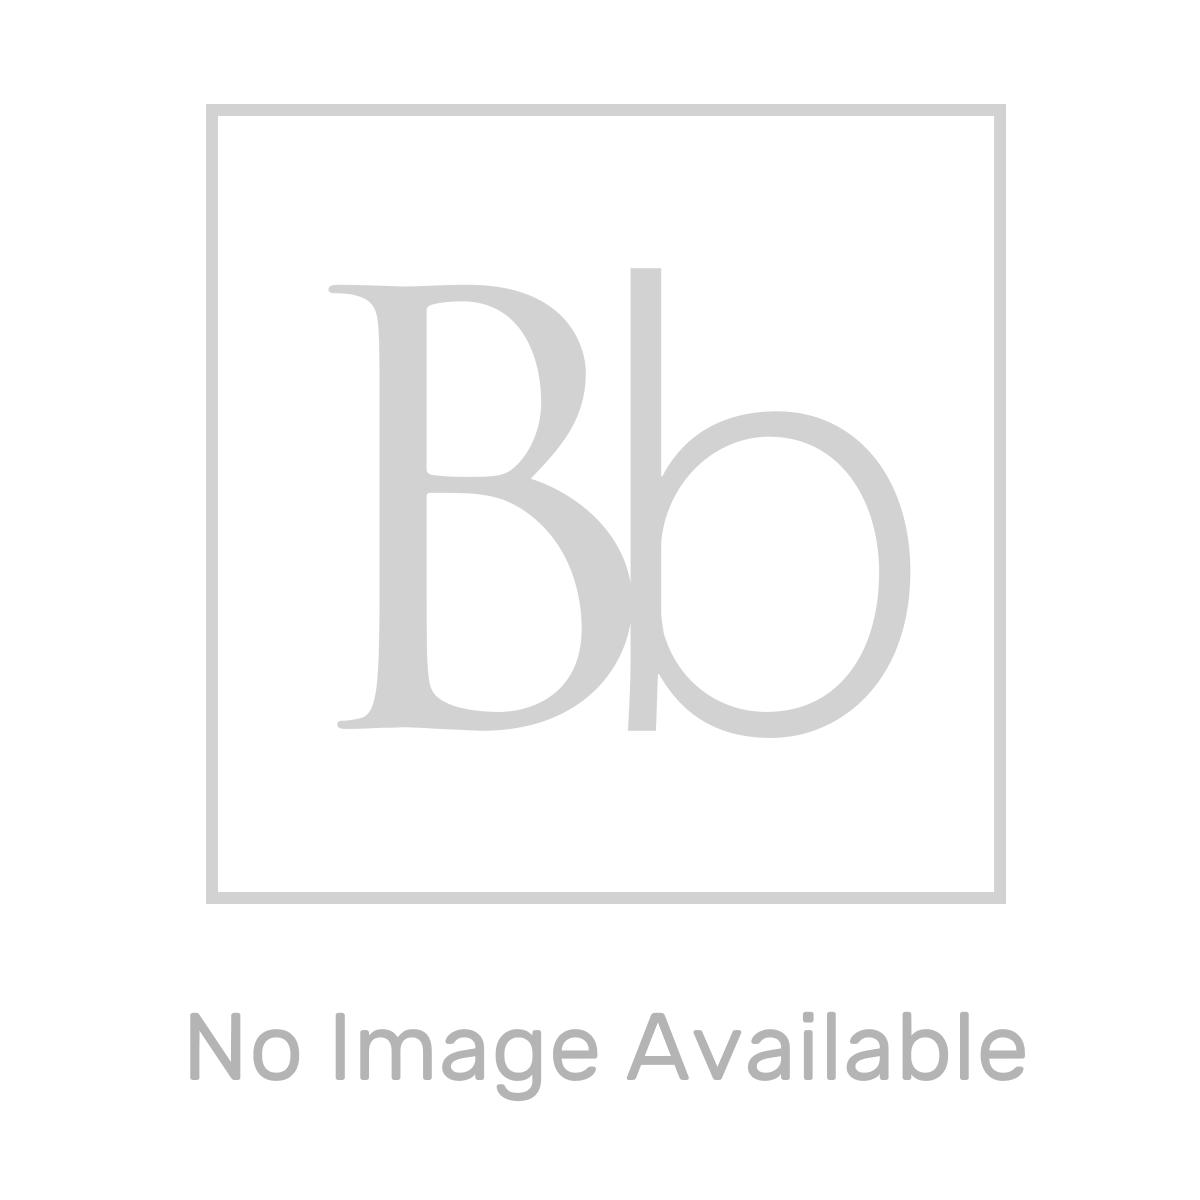 Ikoma White Gloss Vanity Unit with Basin 750mm Roomset